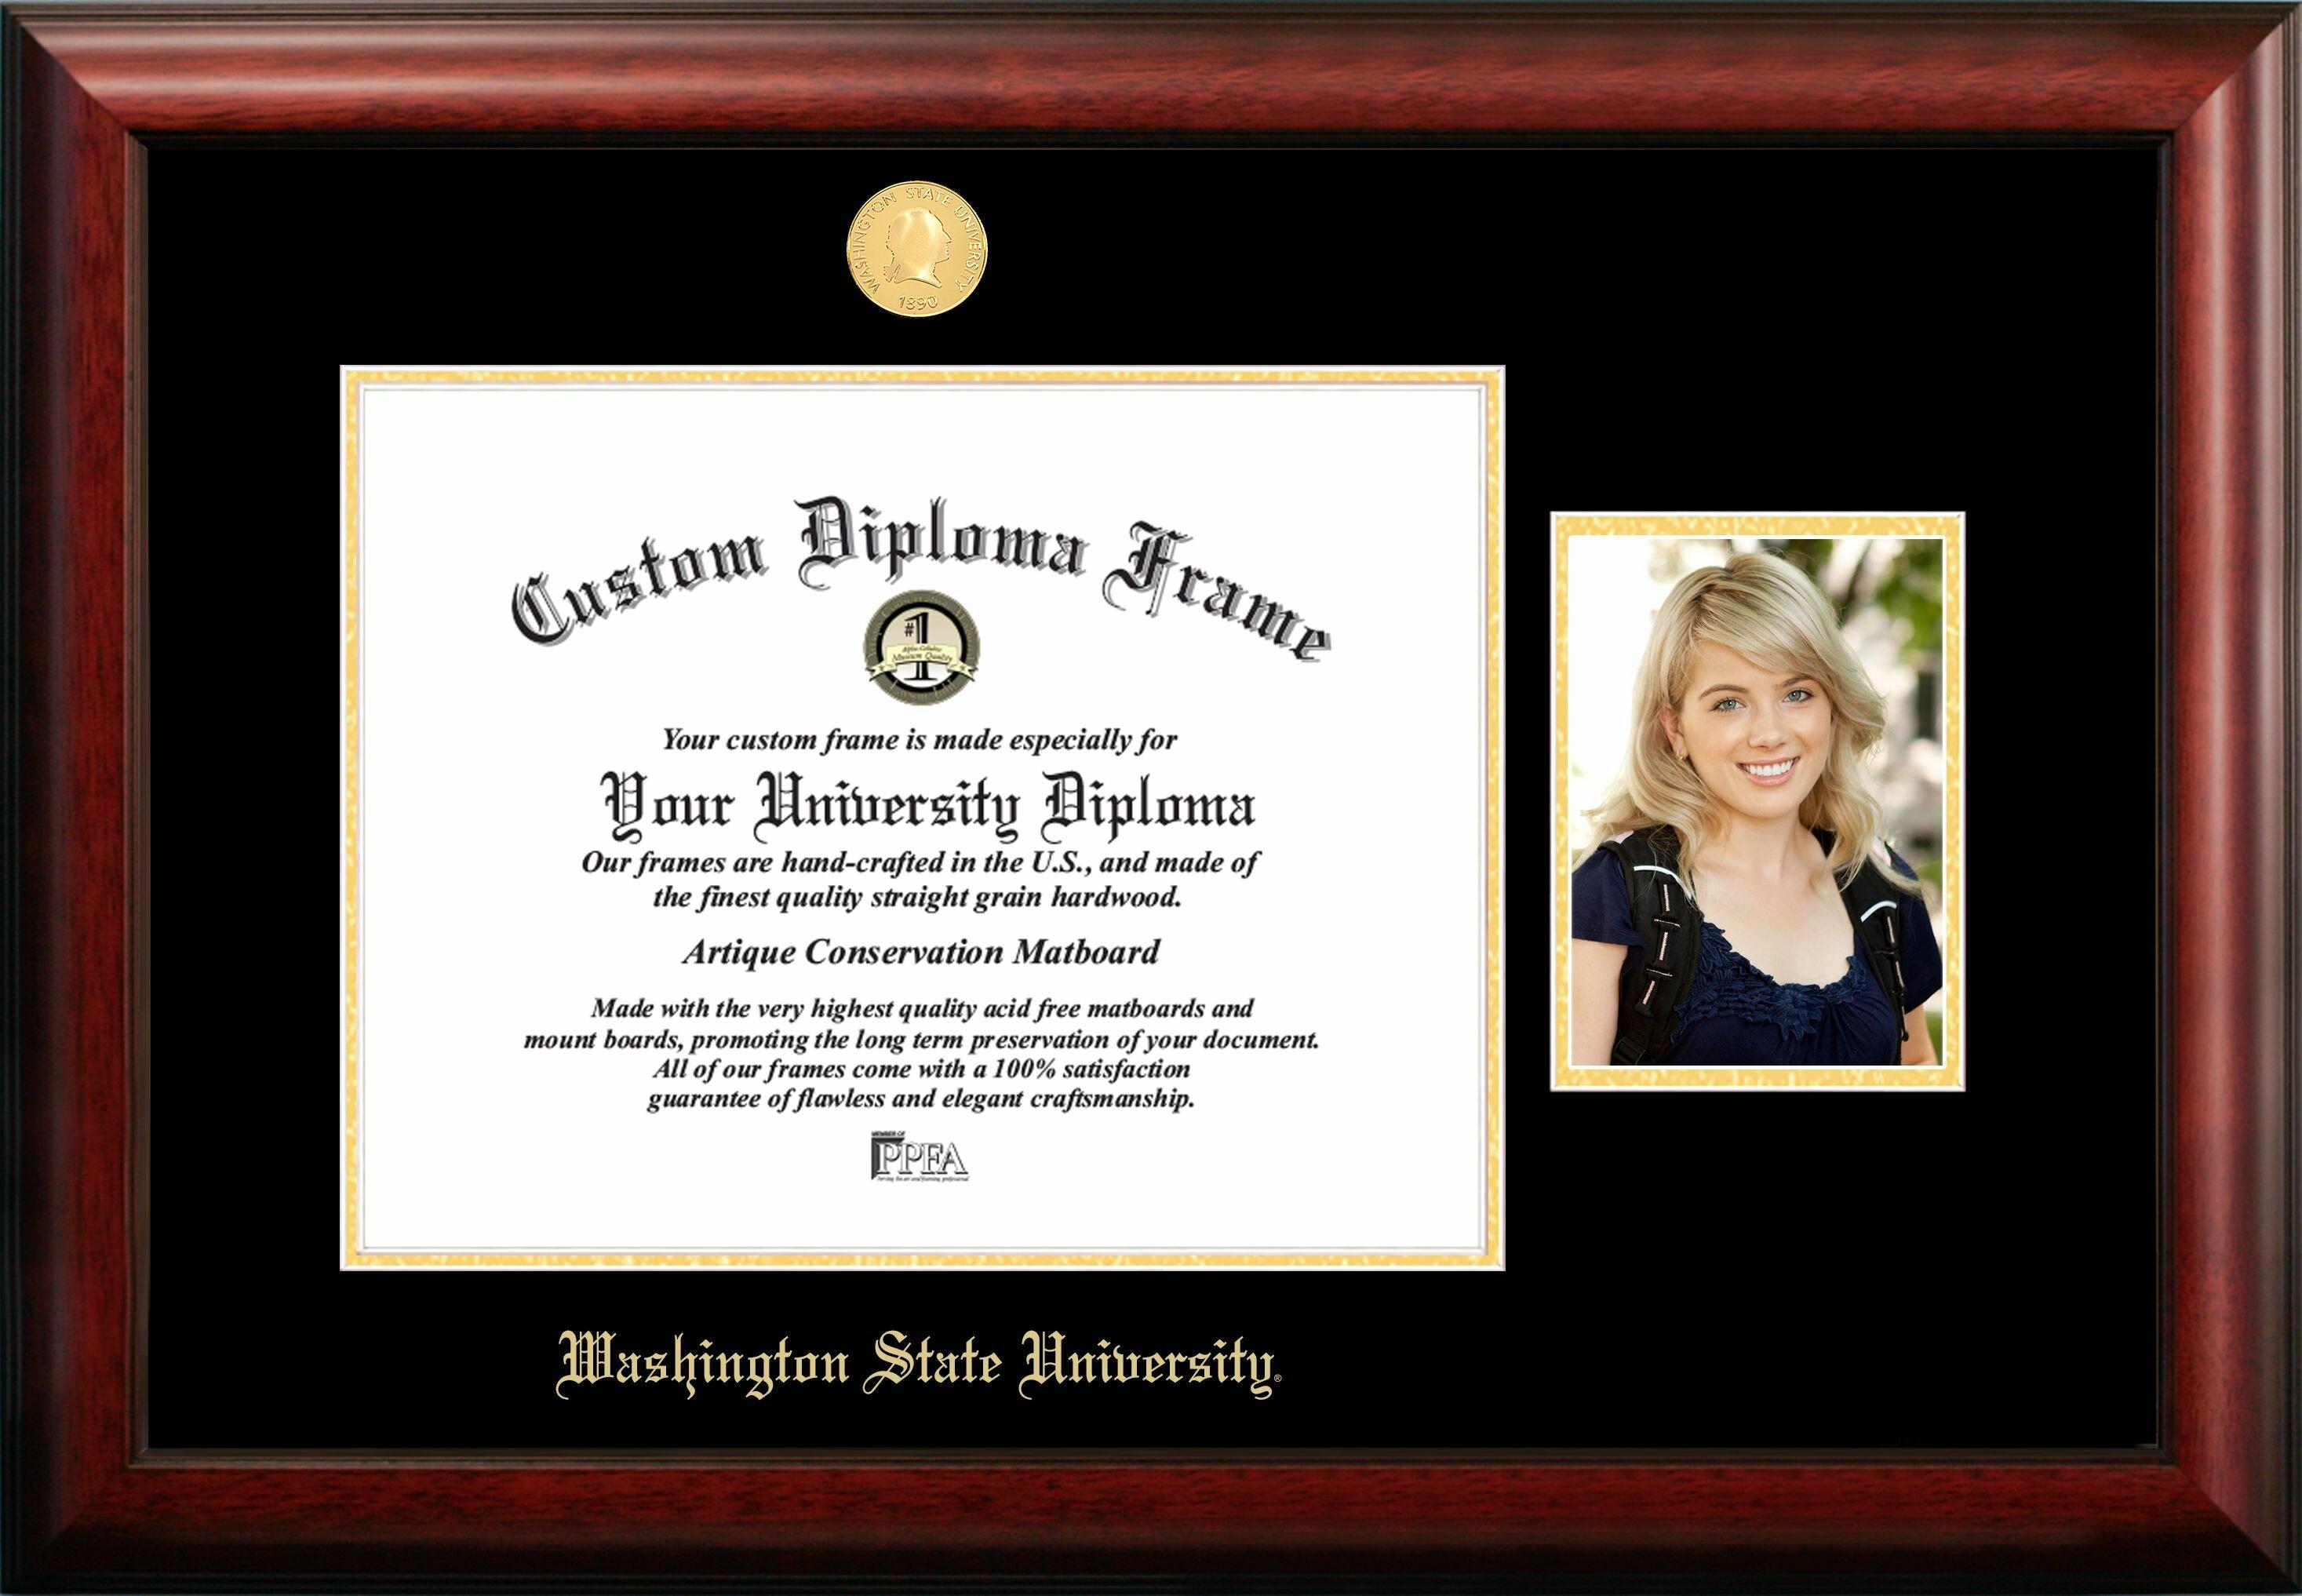 Campus Images Washington State University Embossed Diploma Picture Frame Wayfair